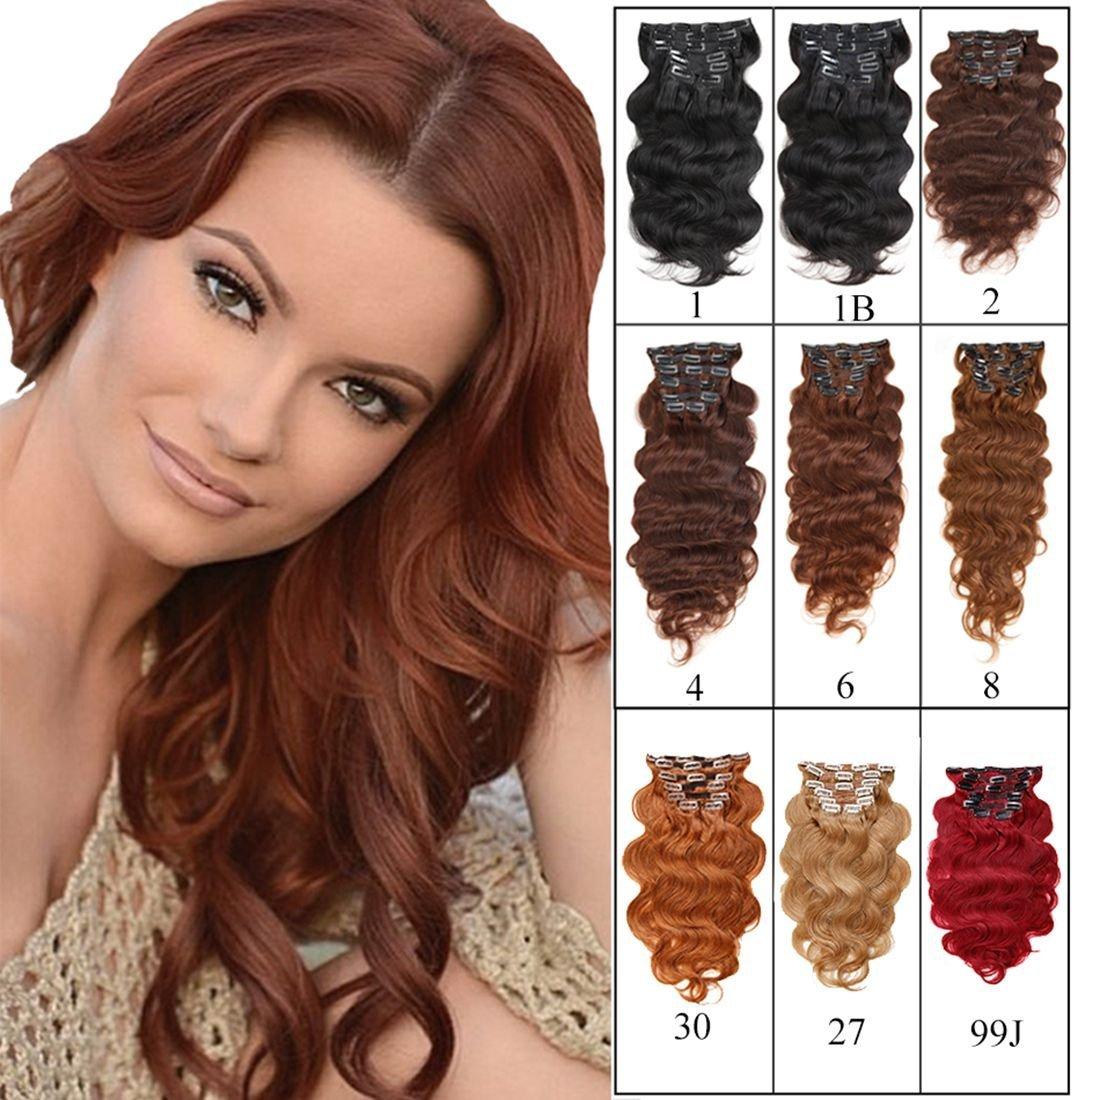 "Full Head Clip in Hair Extensions Body Wave Human Hair Brazilian Virgin Hair Double Weft Black Brown Blonde Burgundy Copper Red 7Peices/set 70g-160g (100g 18"", Auburn Brown)"